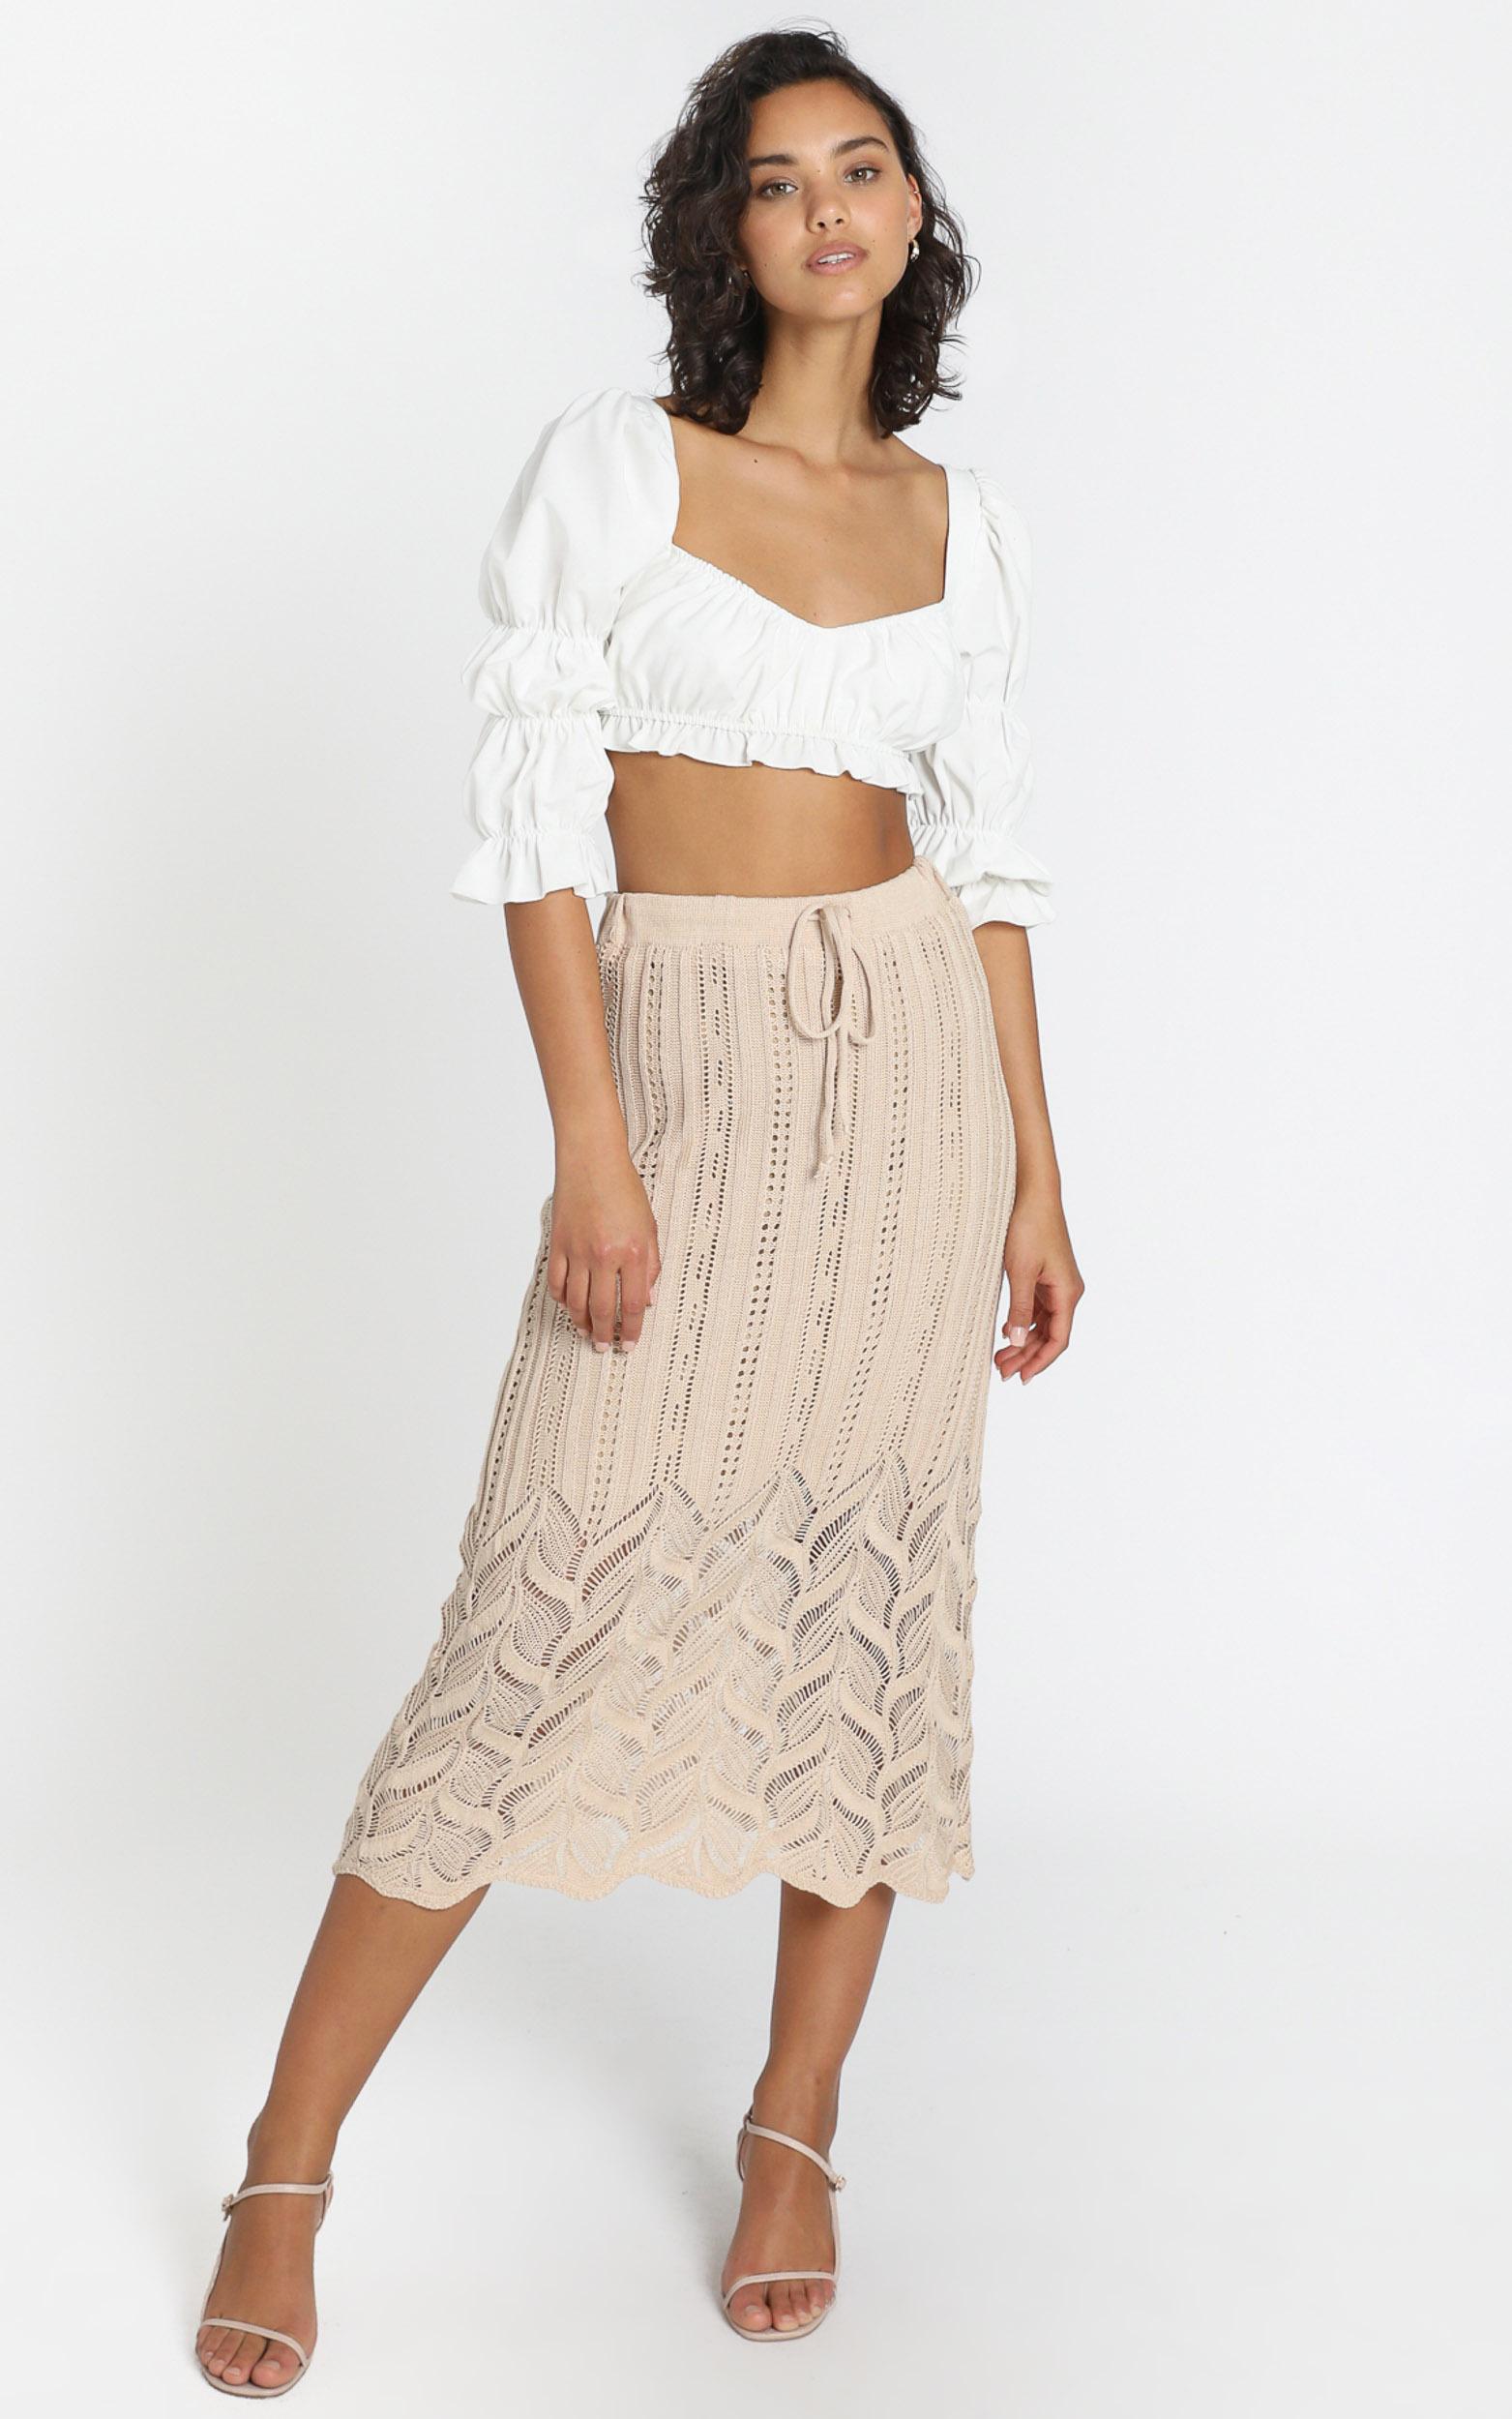 Shakira Skirt in Beige - S, Beige, hi-res image number null